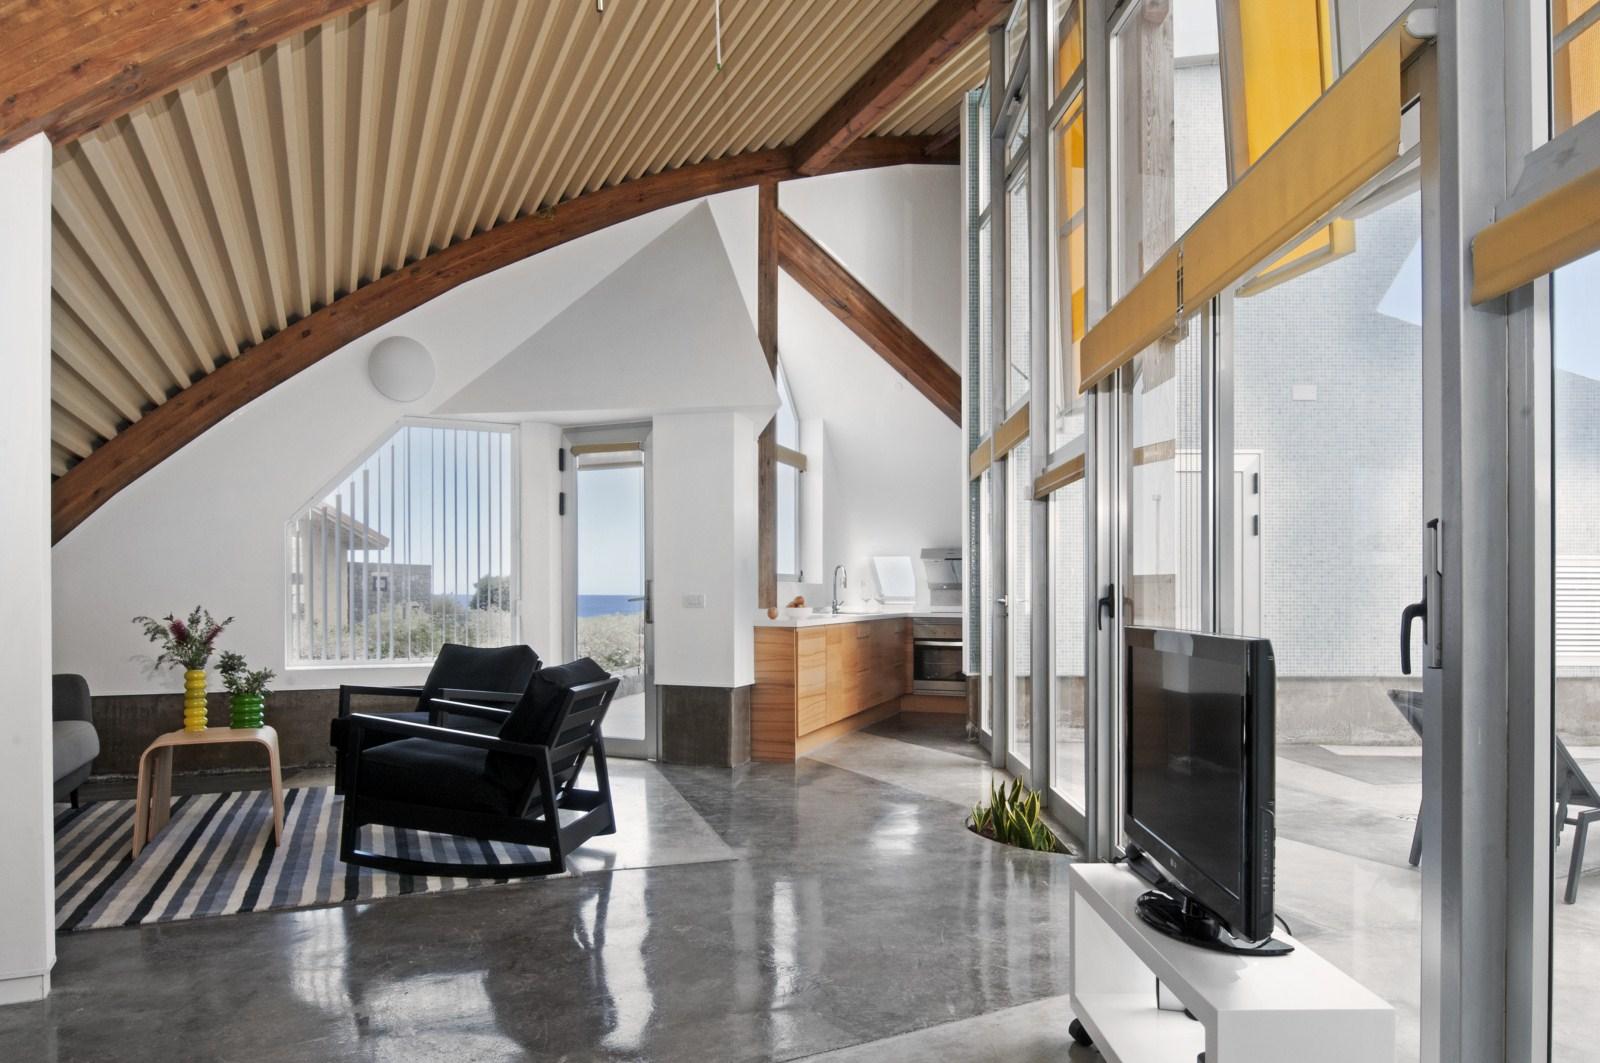 villen auf teneriffa luxusurlaub teneriffa. Black Bedroom Furniture Sets. Home Design Ideas